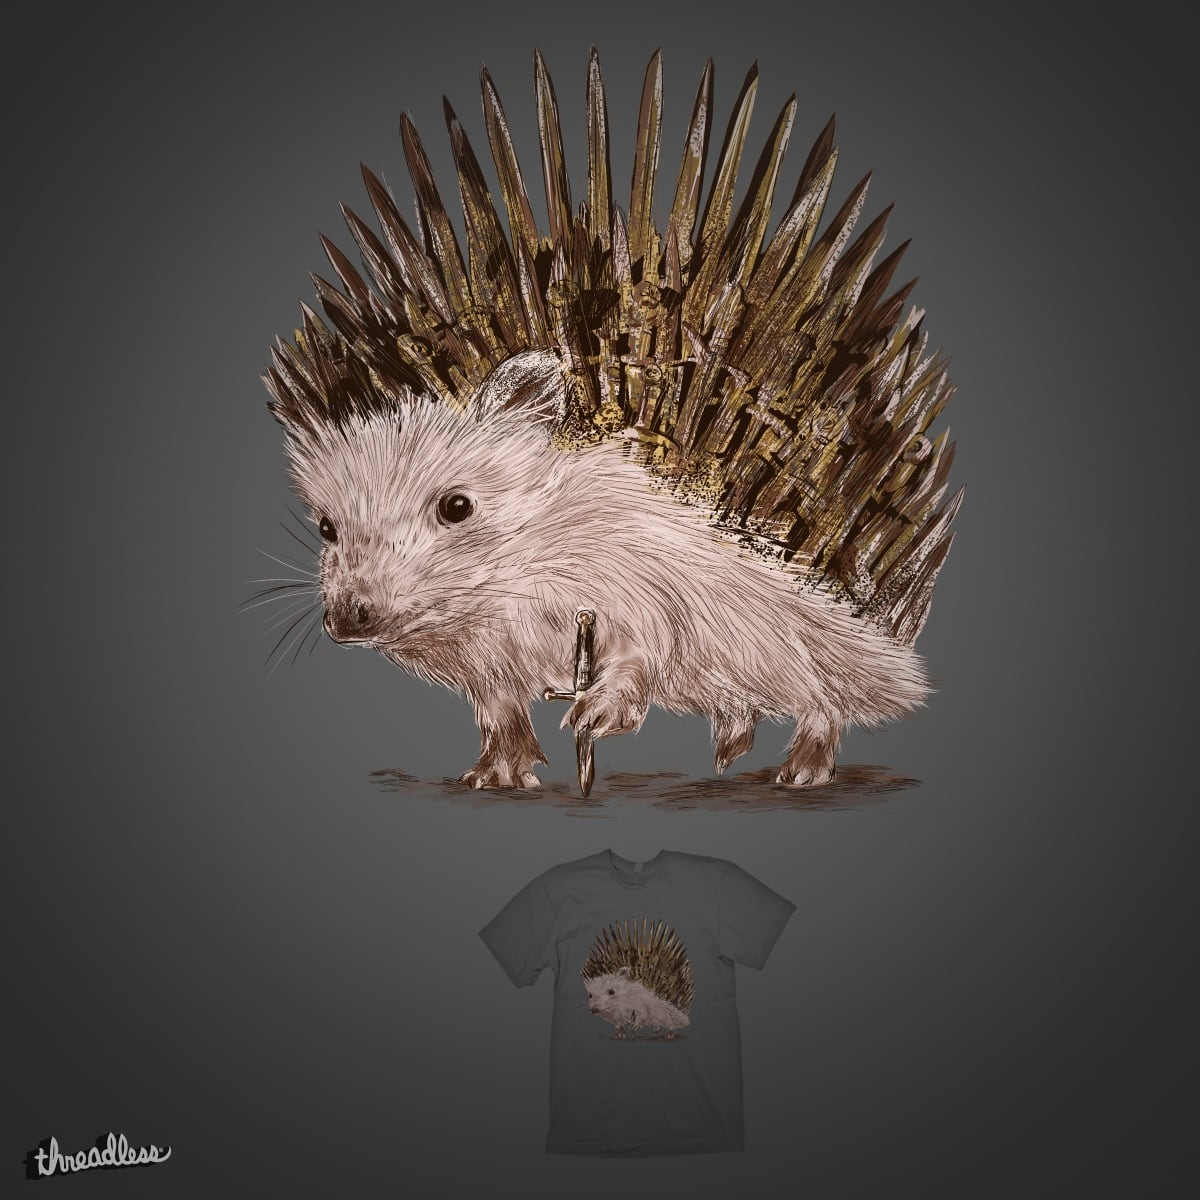 Throne of Thorns by kooky love on Threadless